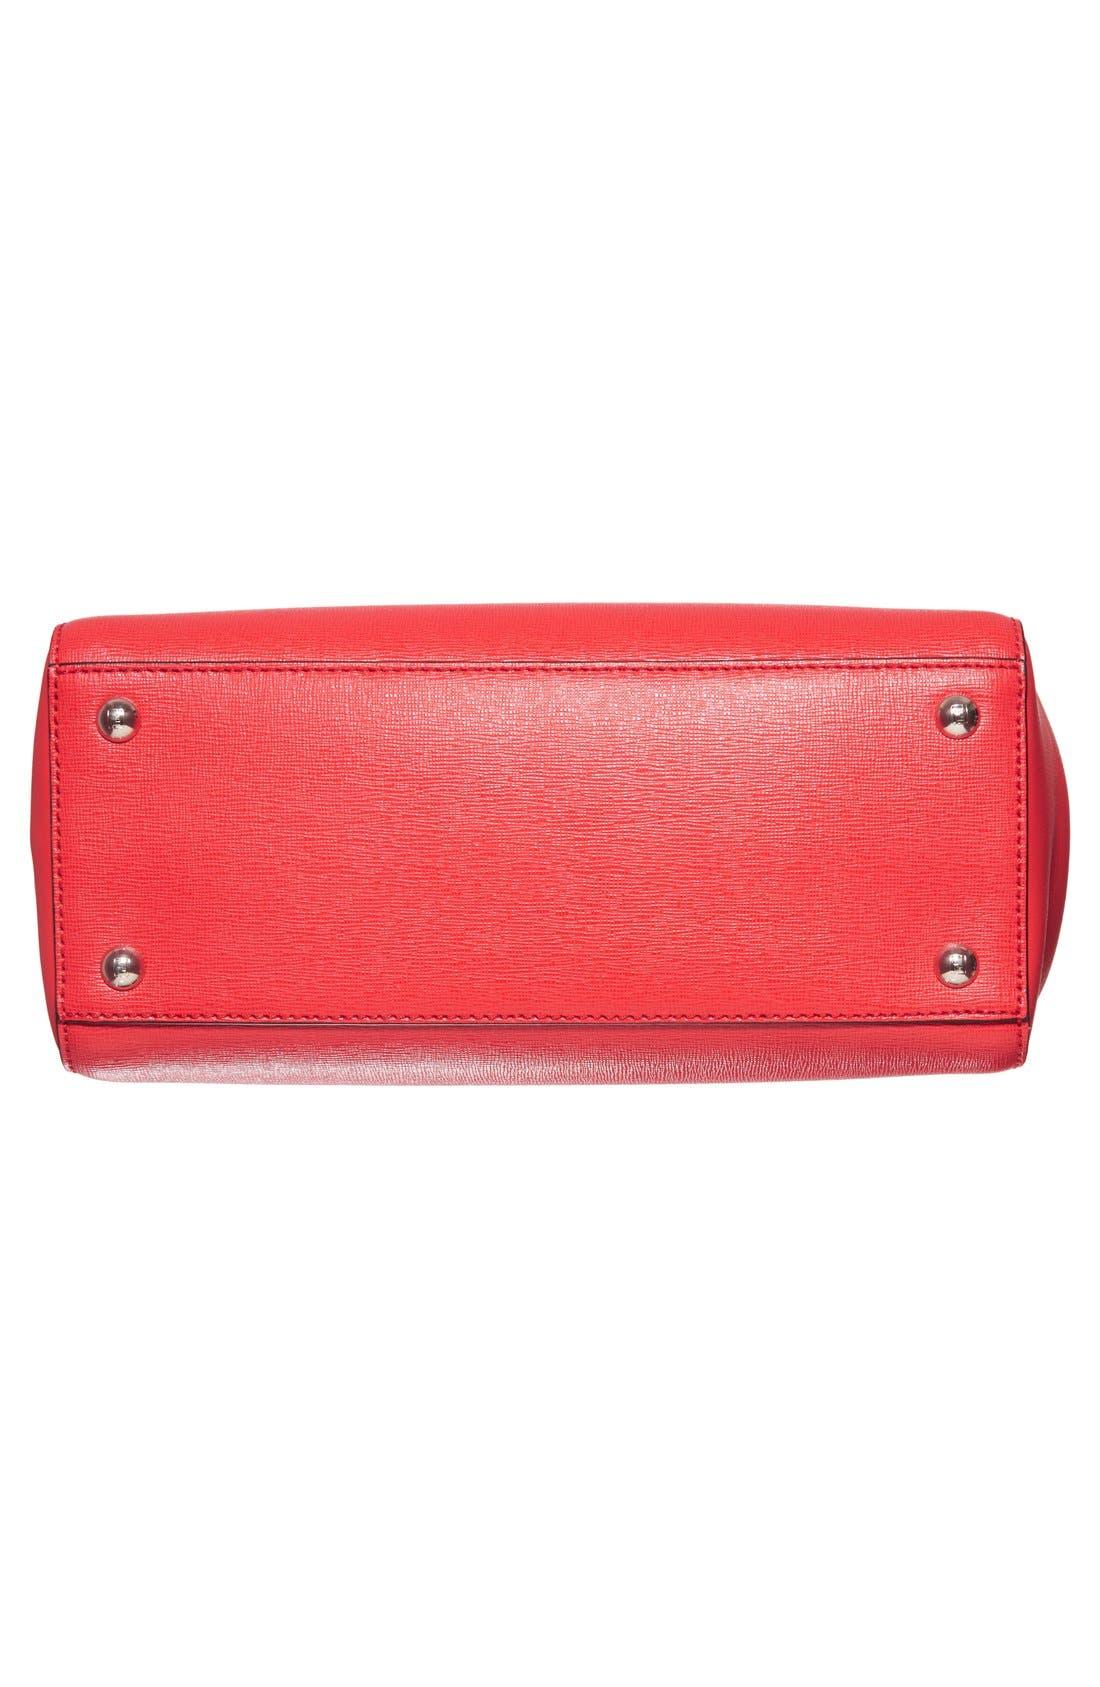 'Petite 2Jours Elite' Leather Shopper,                             Alternate thumbnail 114, color,